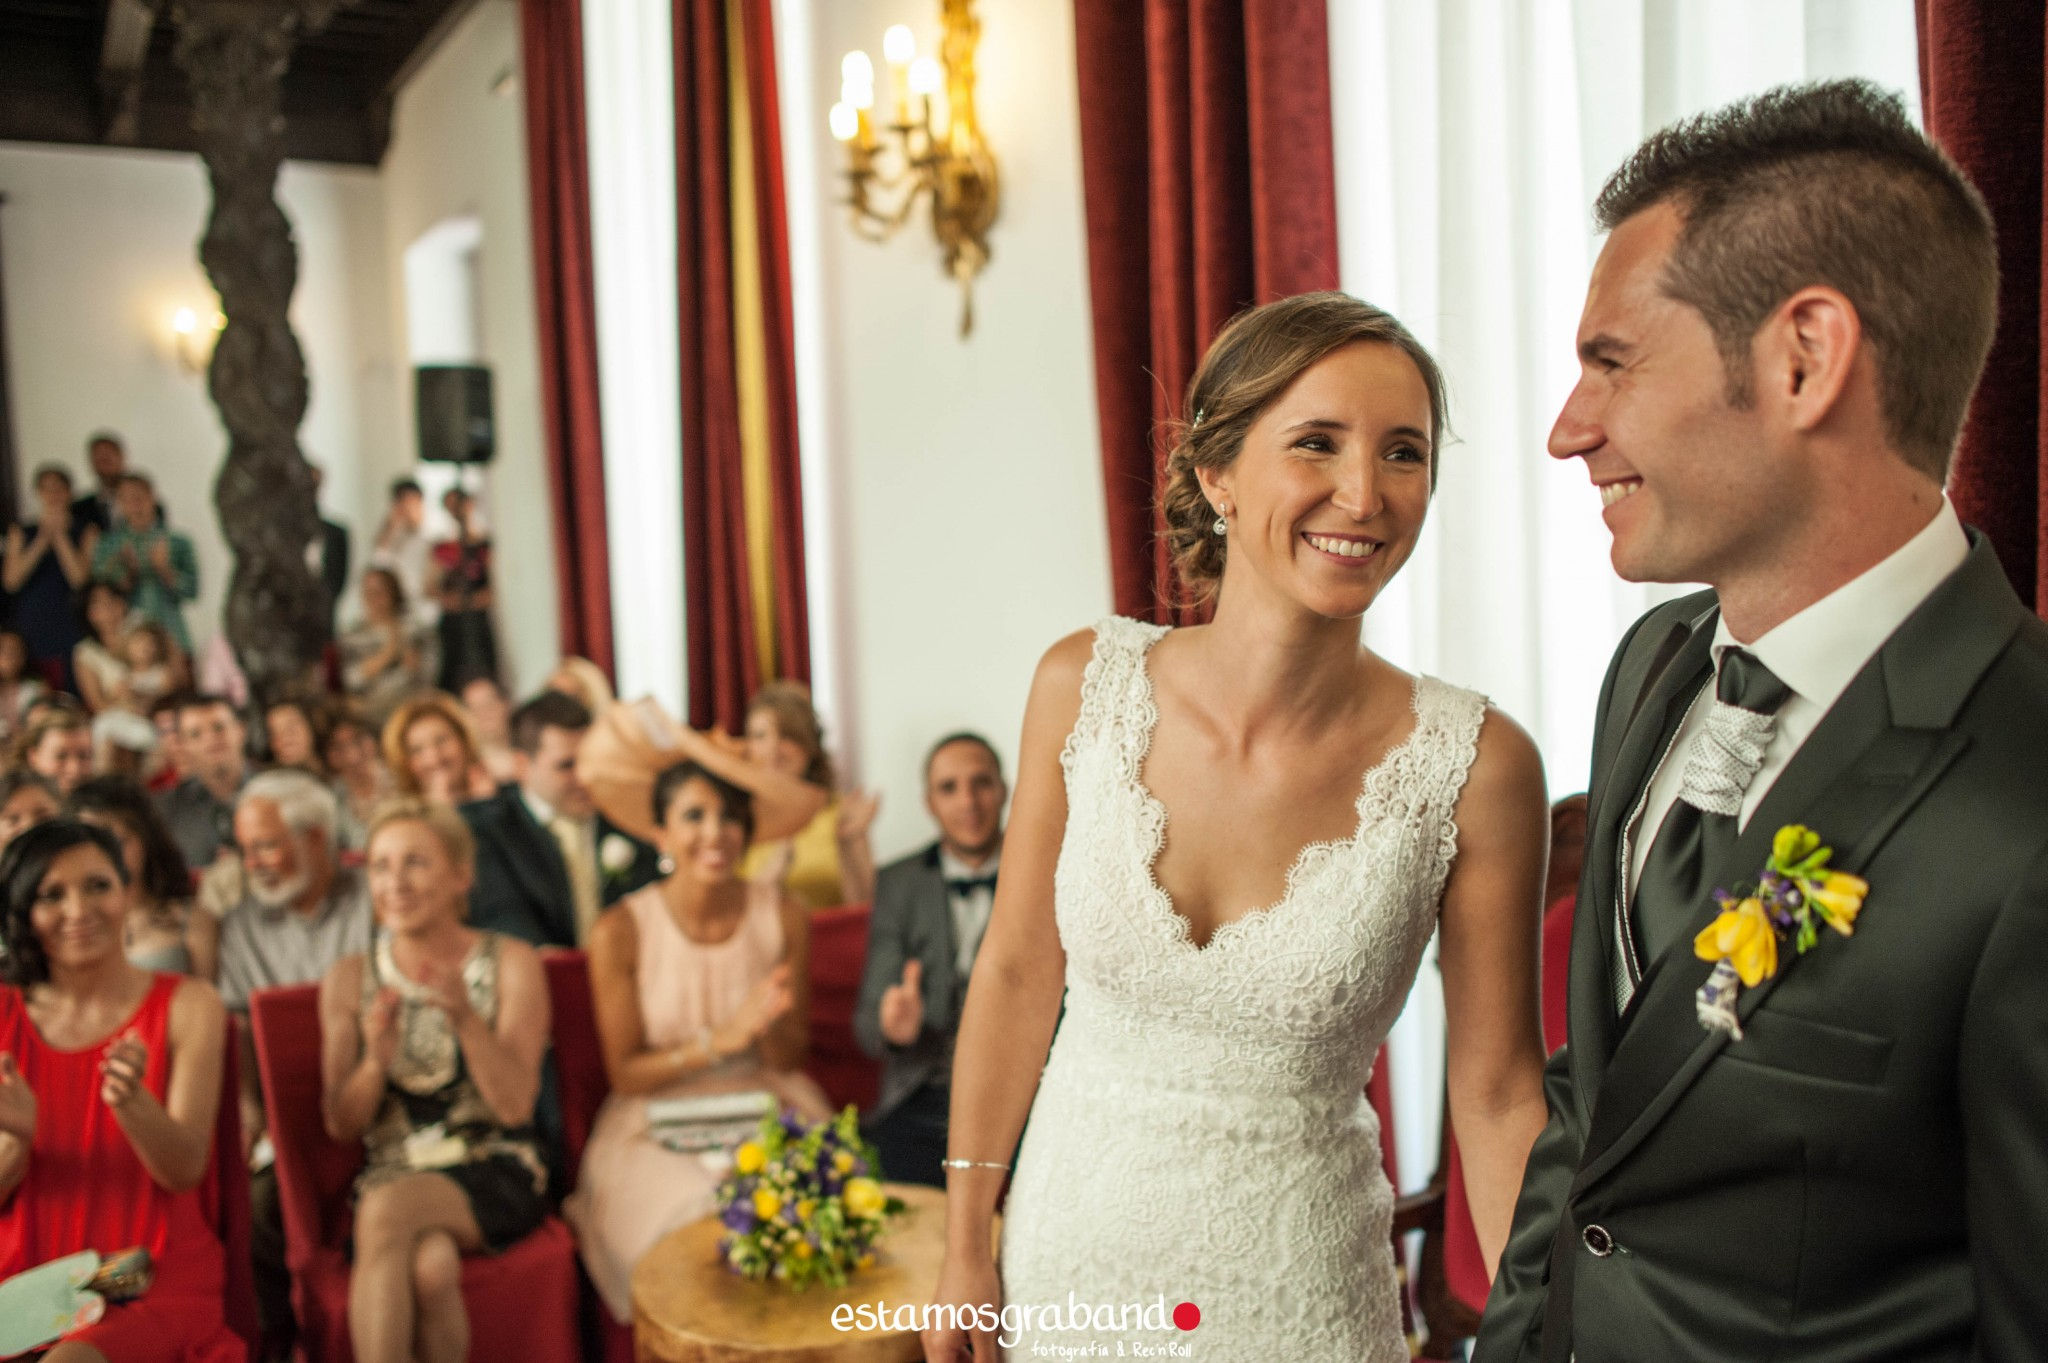 LEO-Y-PEDRO-31 Fotografía de Boda_Leo & Pedro [Jardines de la Mamunia, Granada] - video boda cadiz